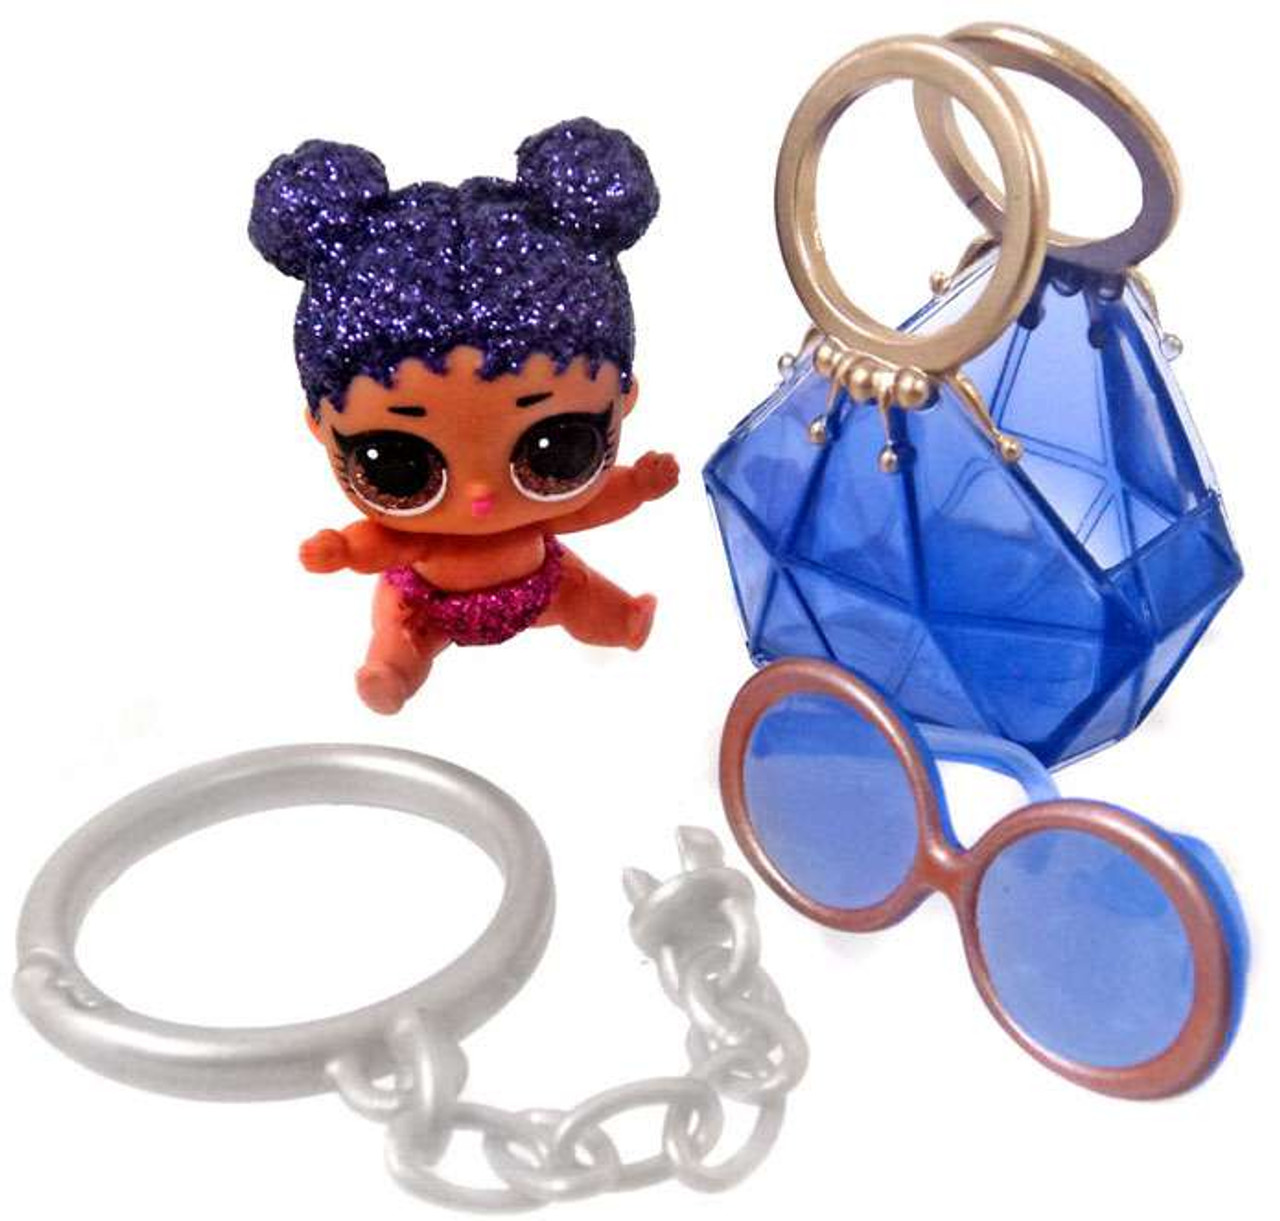 Lol Surprise Limited Edition Little Sister Purple Queen 2 Figure S